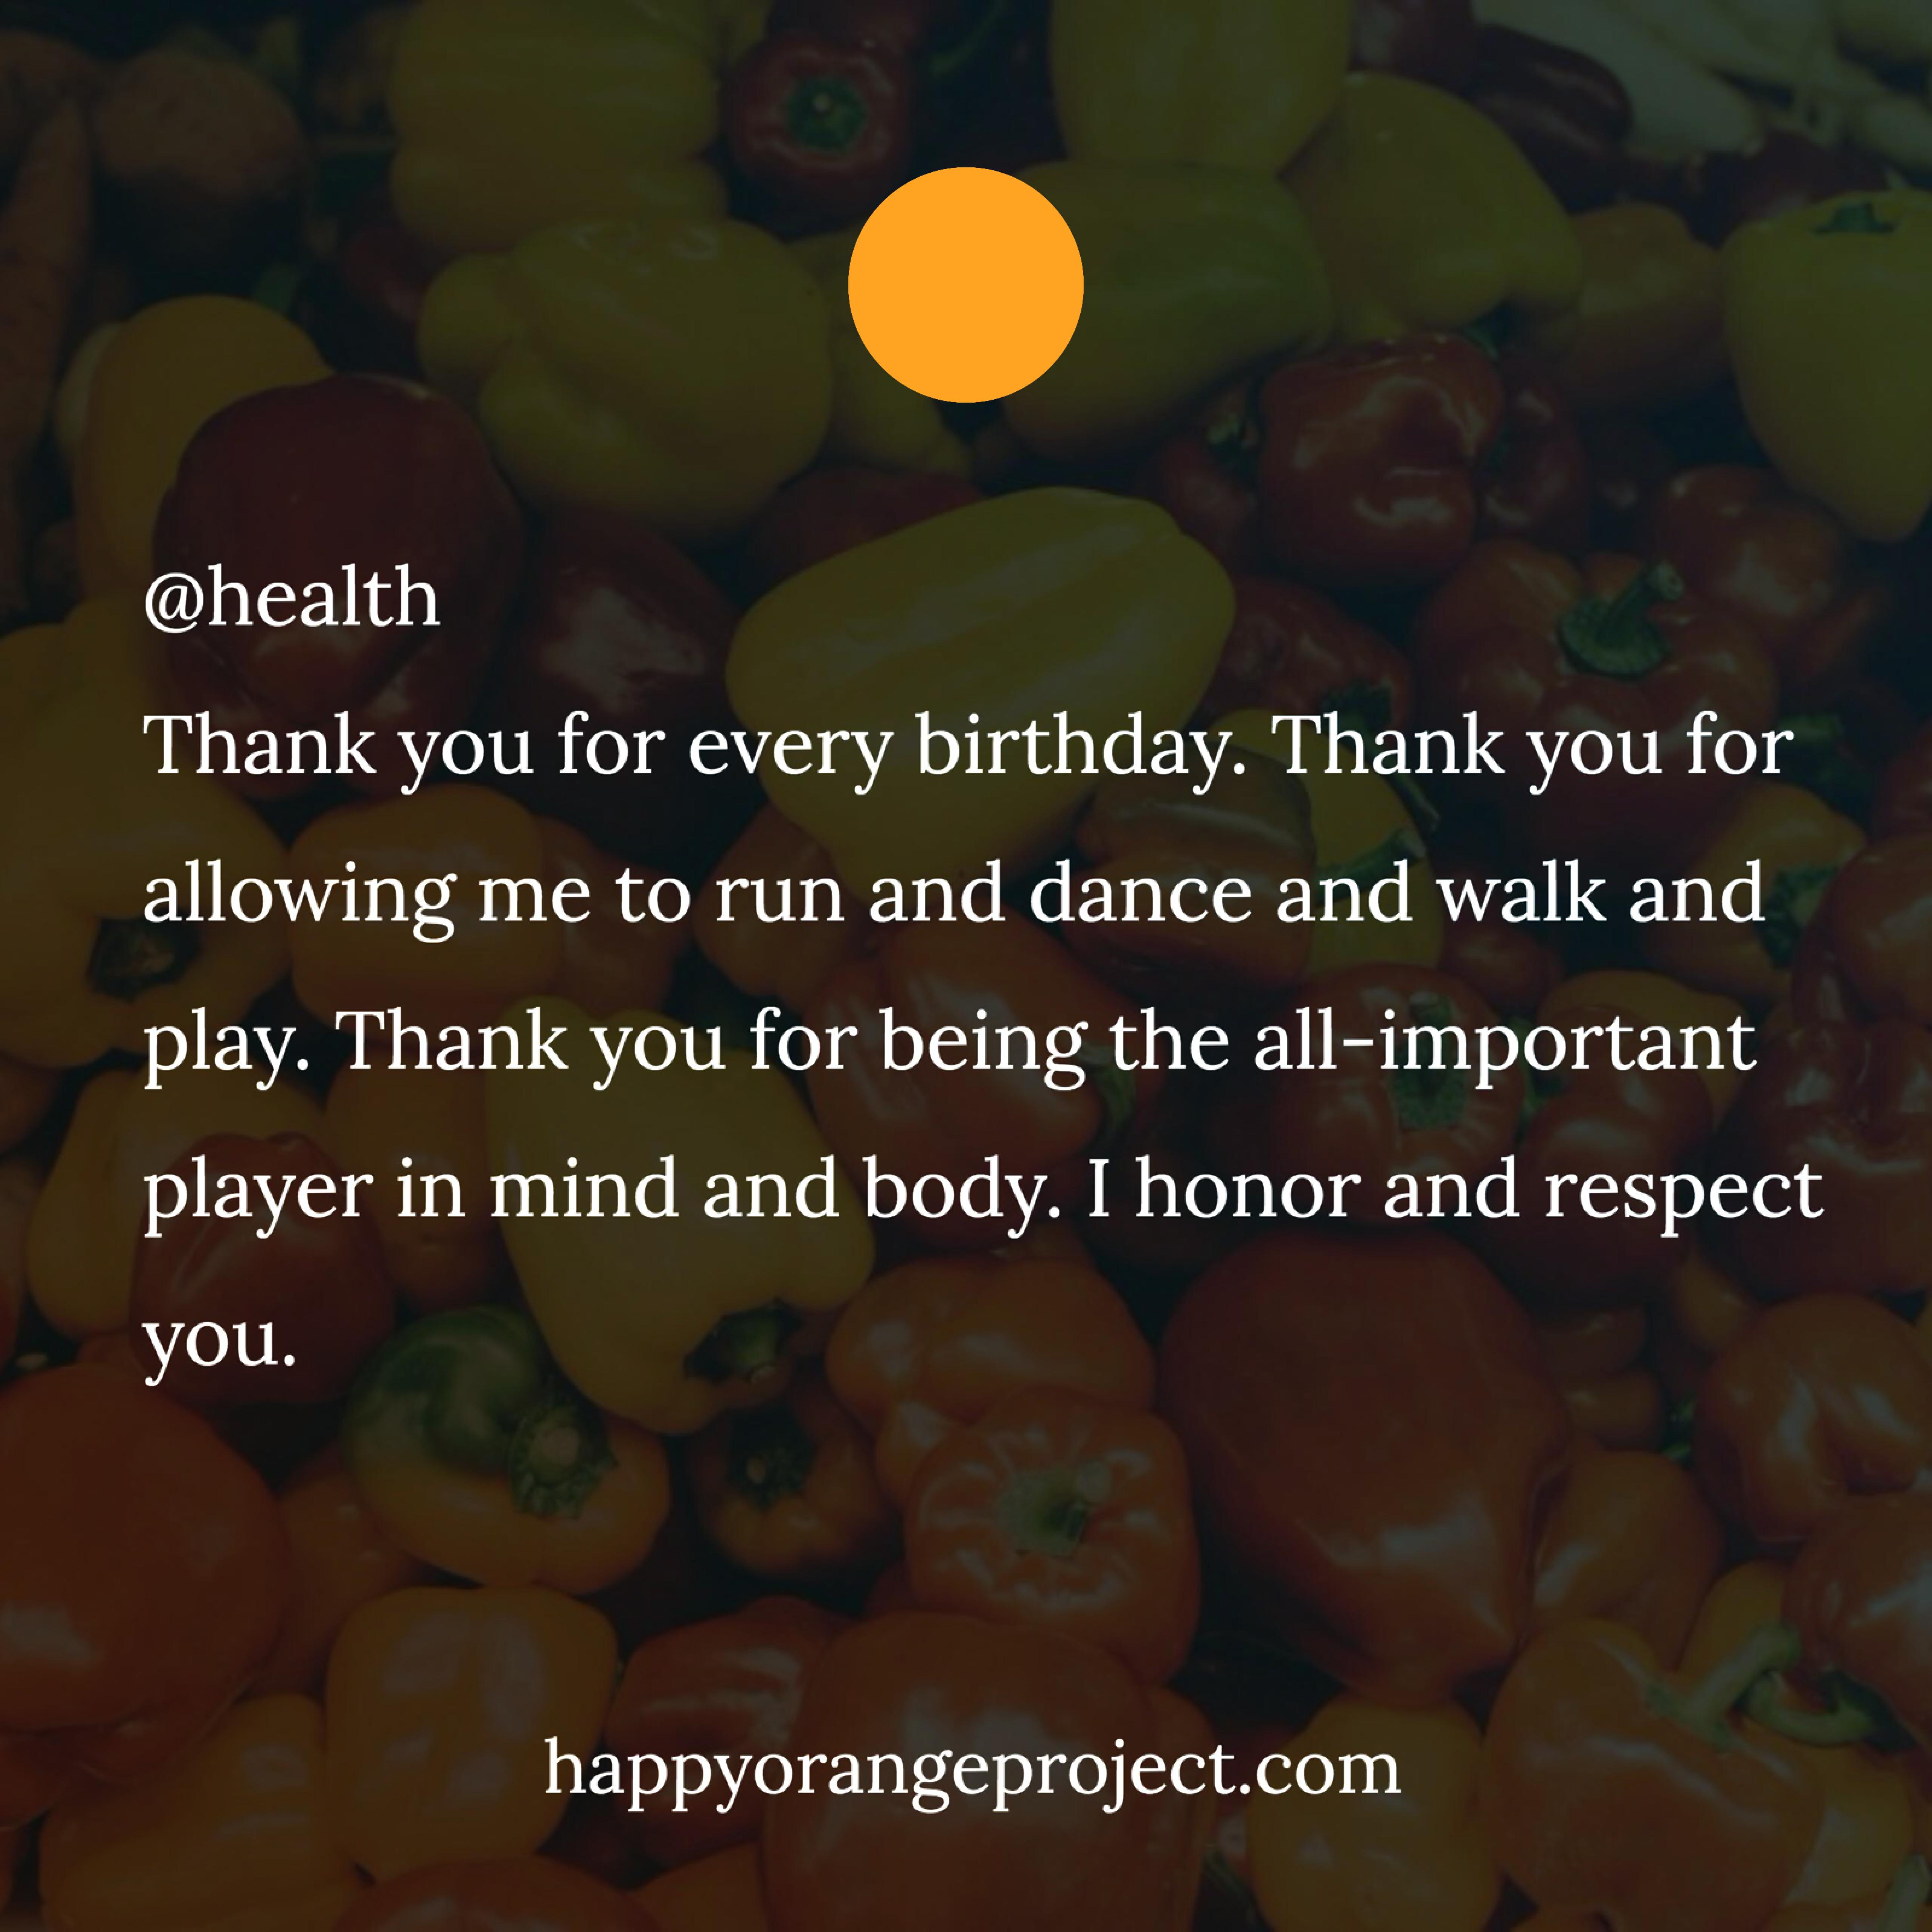 @health